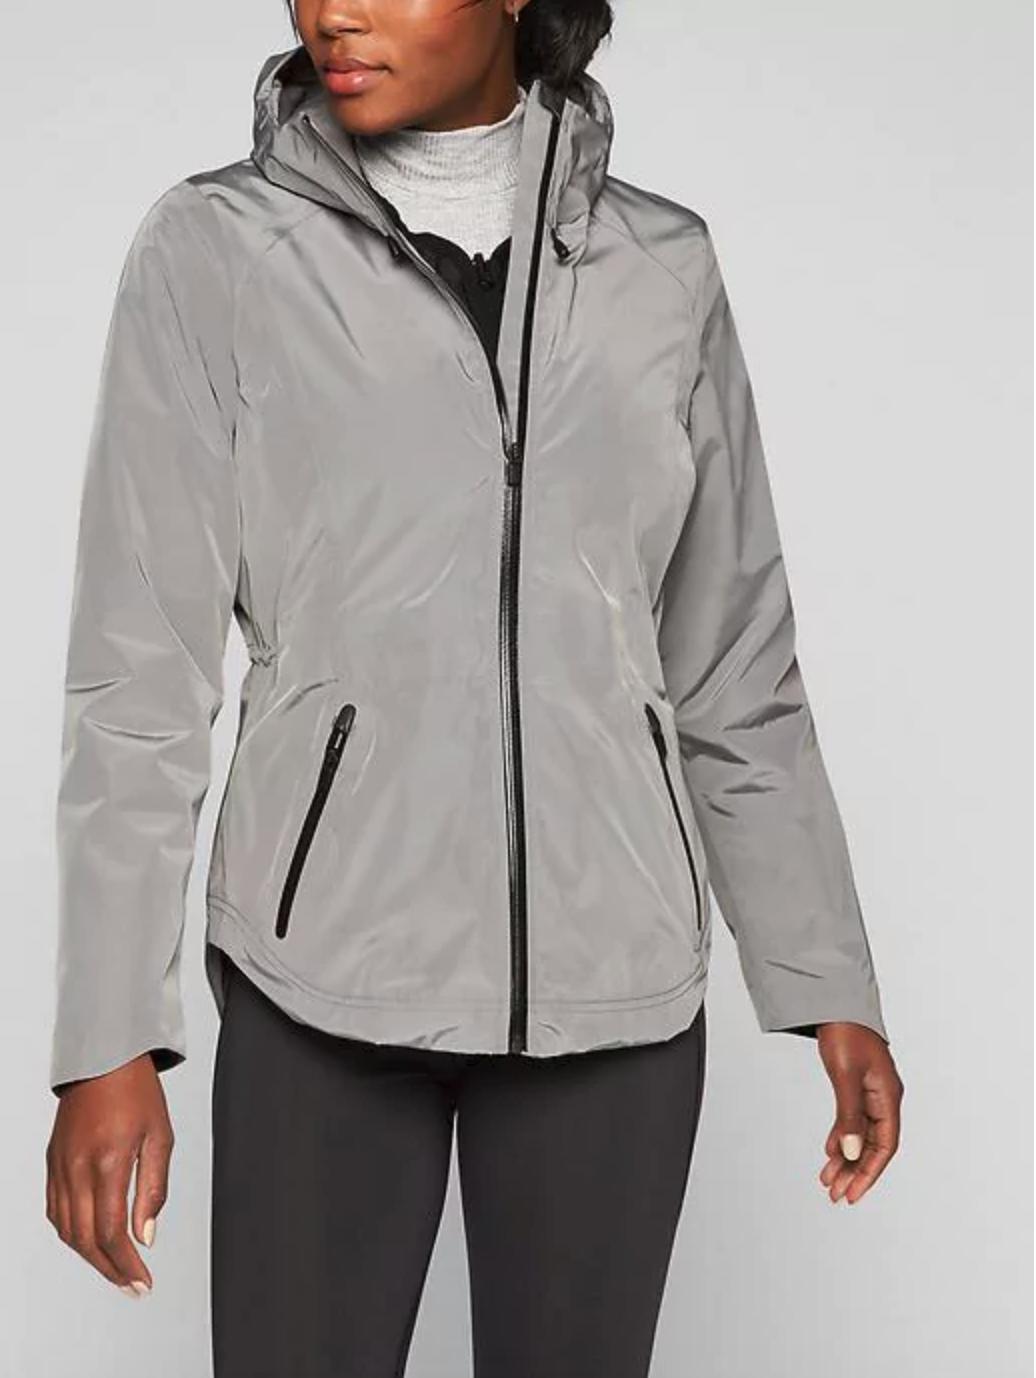 Athleta Triple Cascade 3 in 1 Coat Jacket,Light Asphalt/ Black SIZE S #842298 N